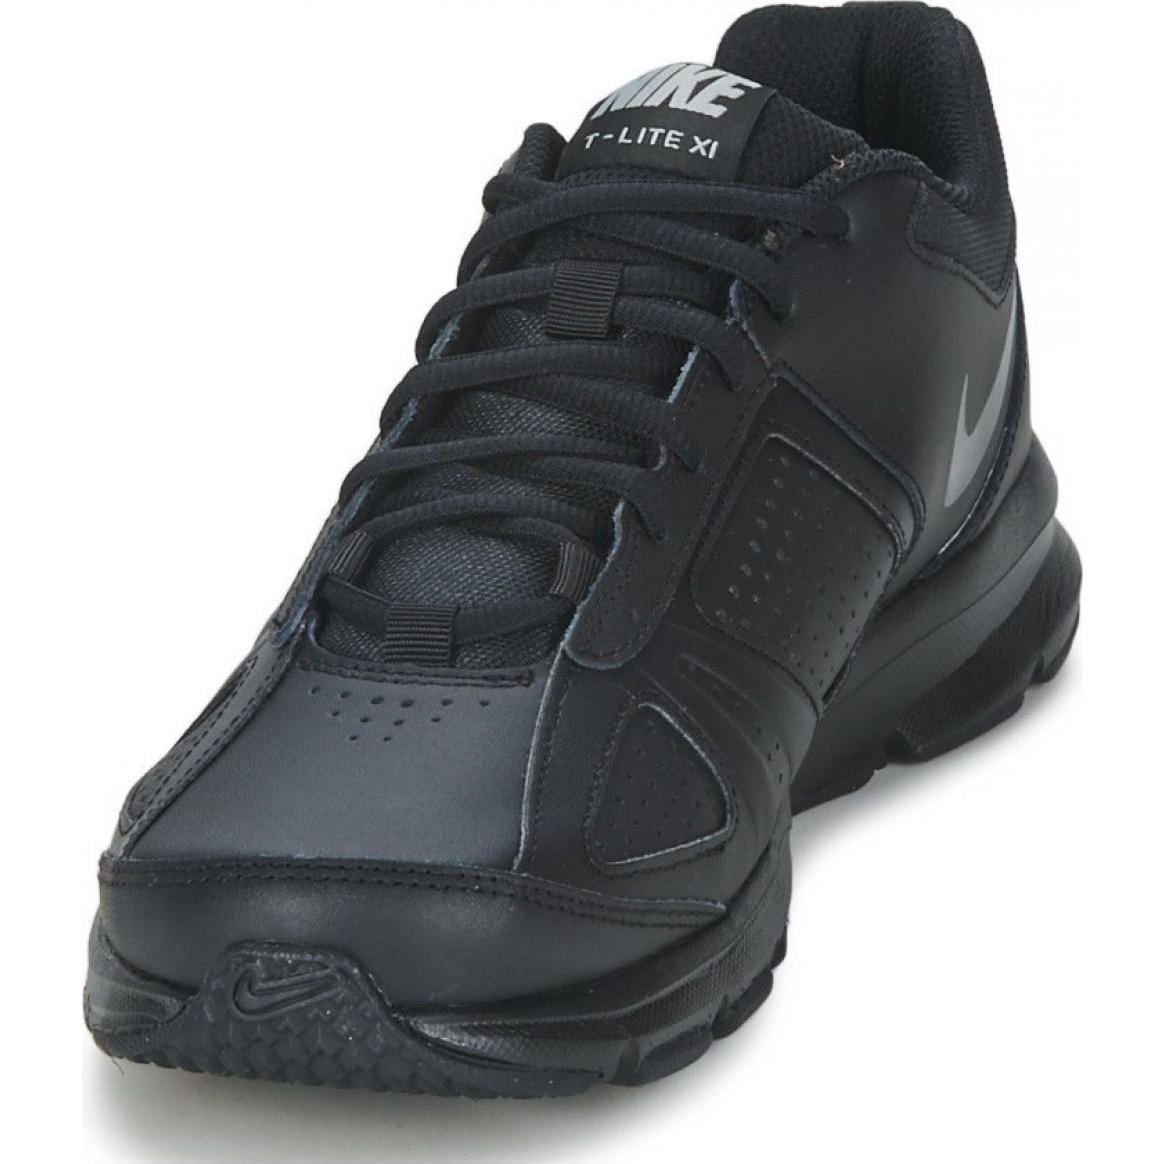 Sentirse mal Sin valor Polinizar  Training shoes Nike T-Lite Xi M 616544-007 Q3 black - ButyModne.pl